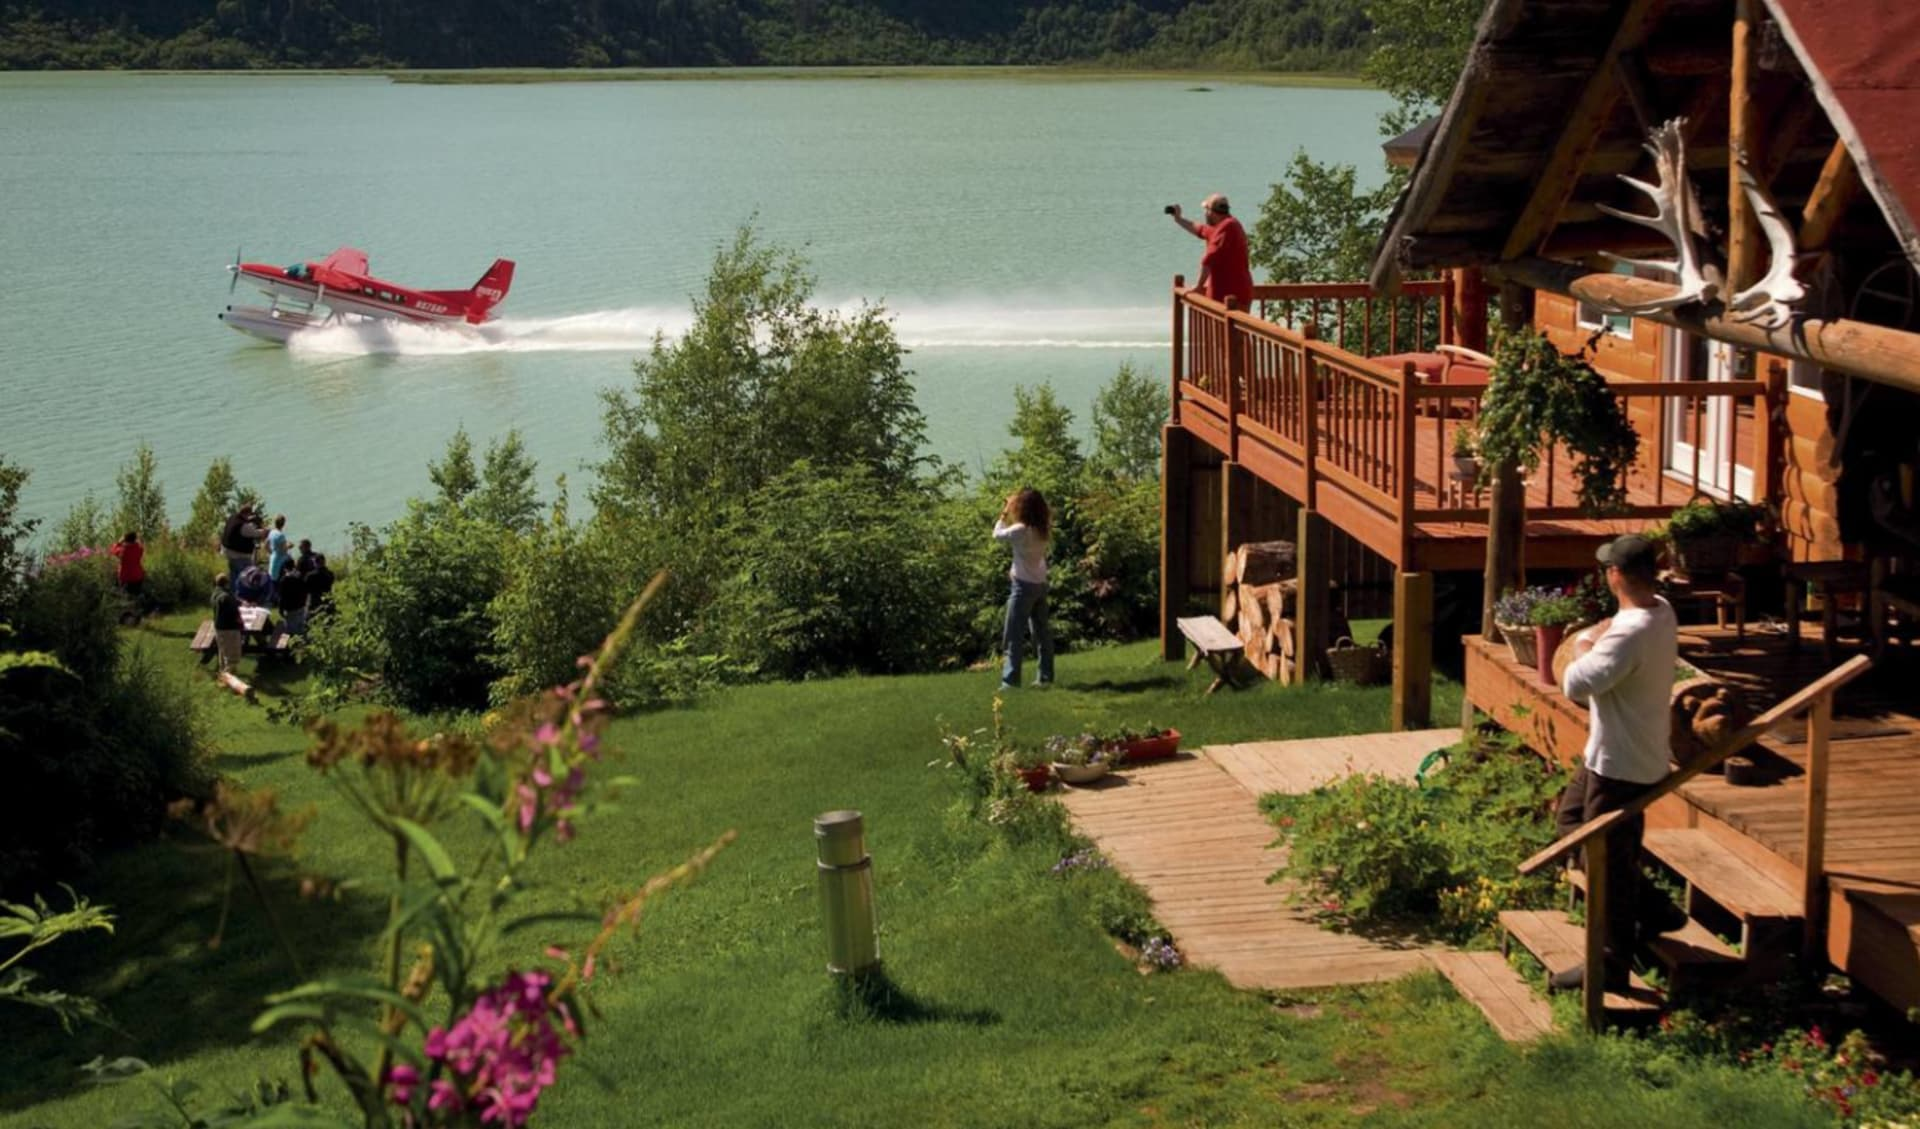 Bärenbeobachtung Redoubt Bay Lodge 3 Tage ab Anchorage: Alaska - Redoubt Bay Lodge - Hauptgebäude